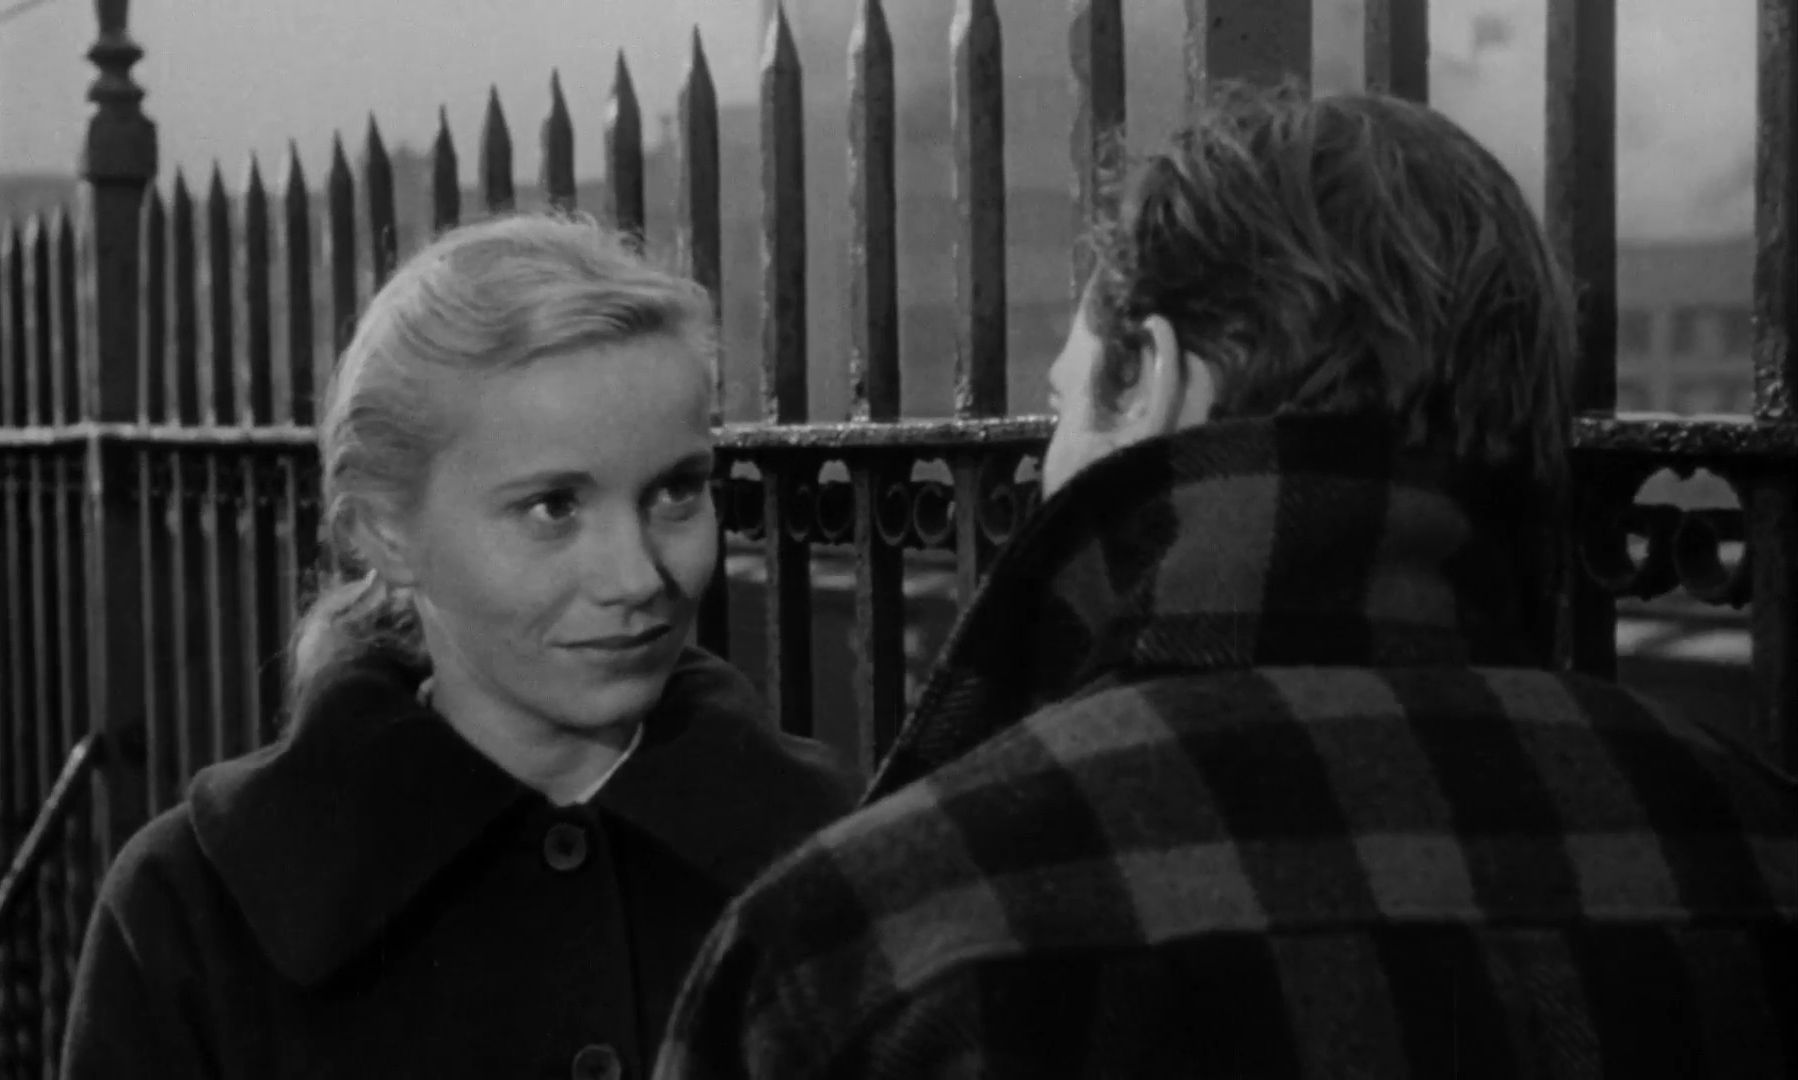 Eva Marie Saint and Marlon Brando in